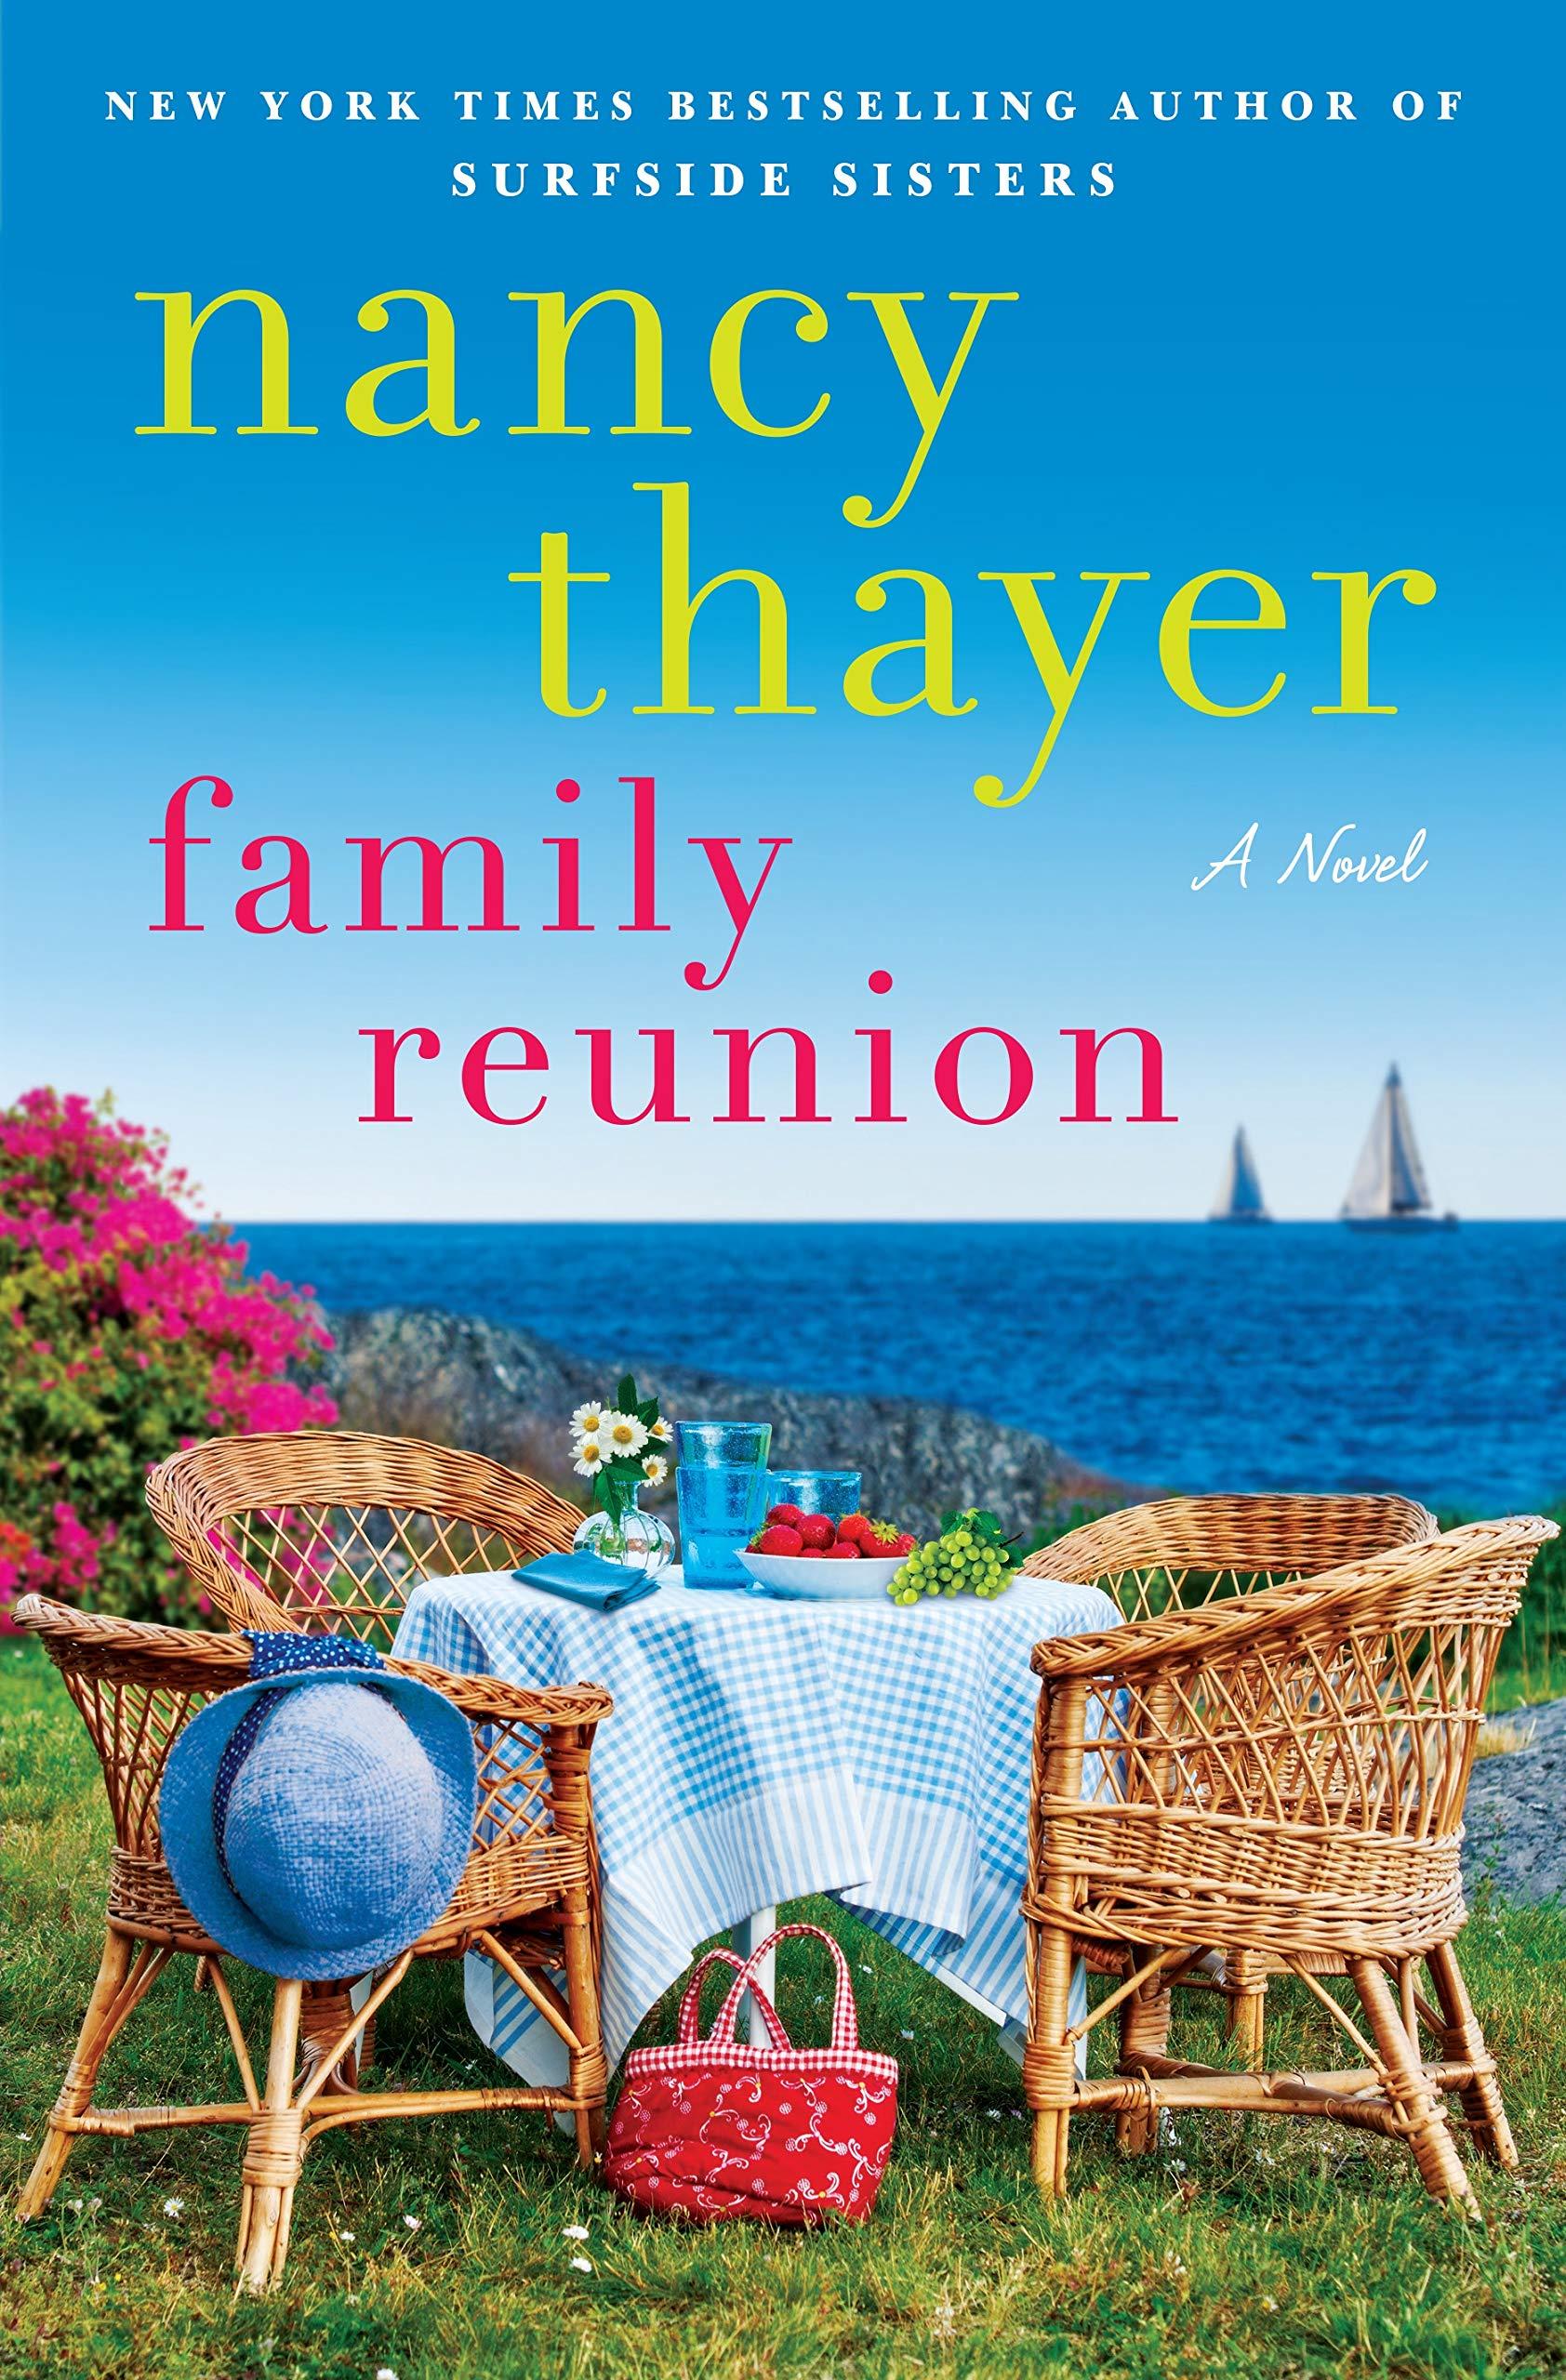 Family Reunion: A Novel: Thayer, Nancy: 9781524798789: Amazon.com: Books